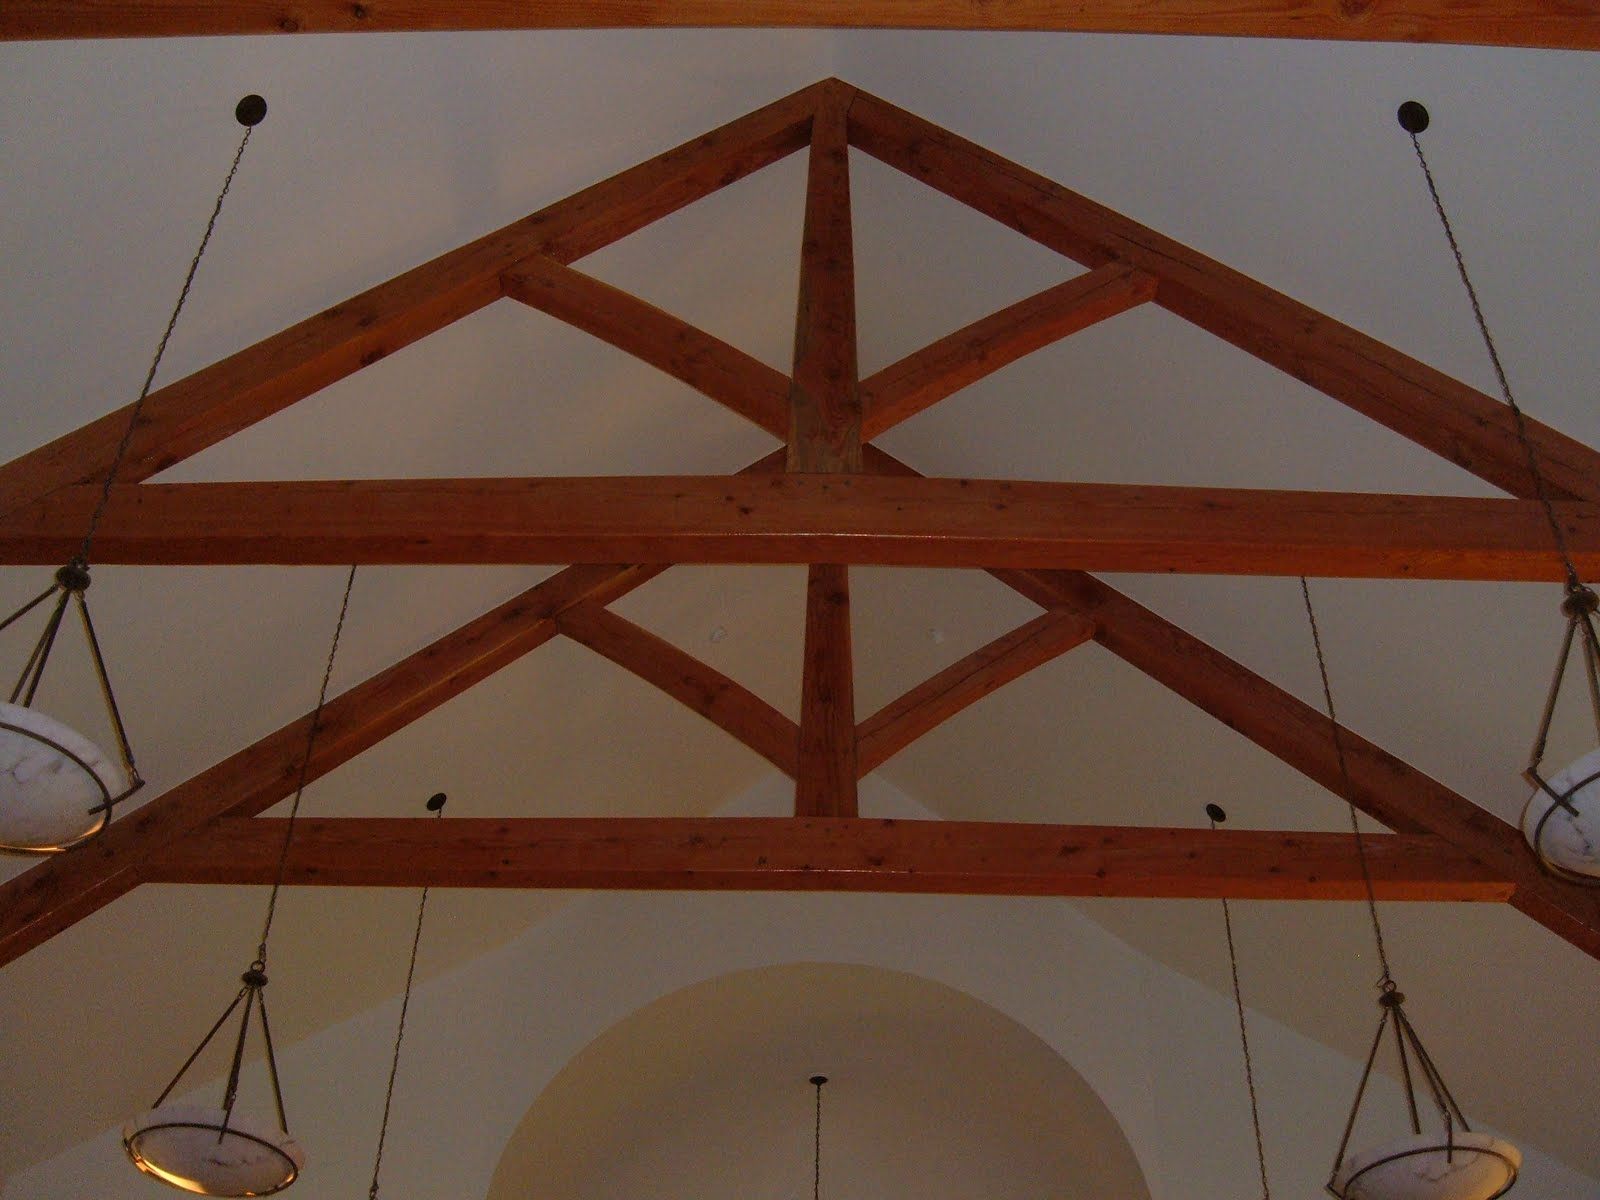 Downing Chapel, East Burke, VT